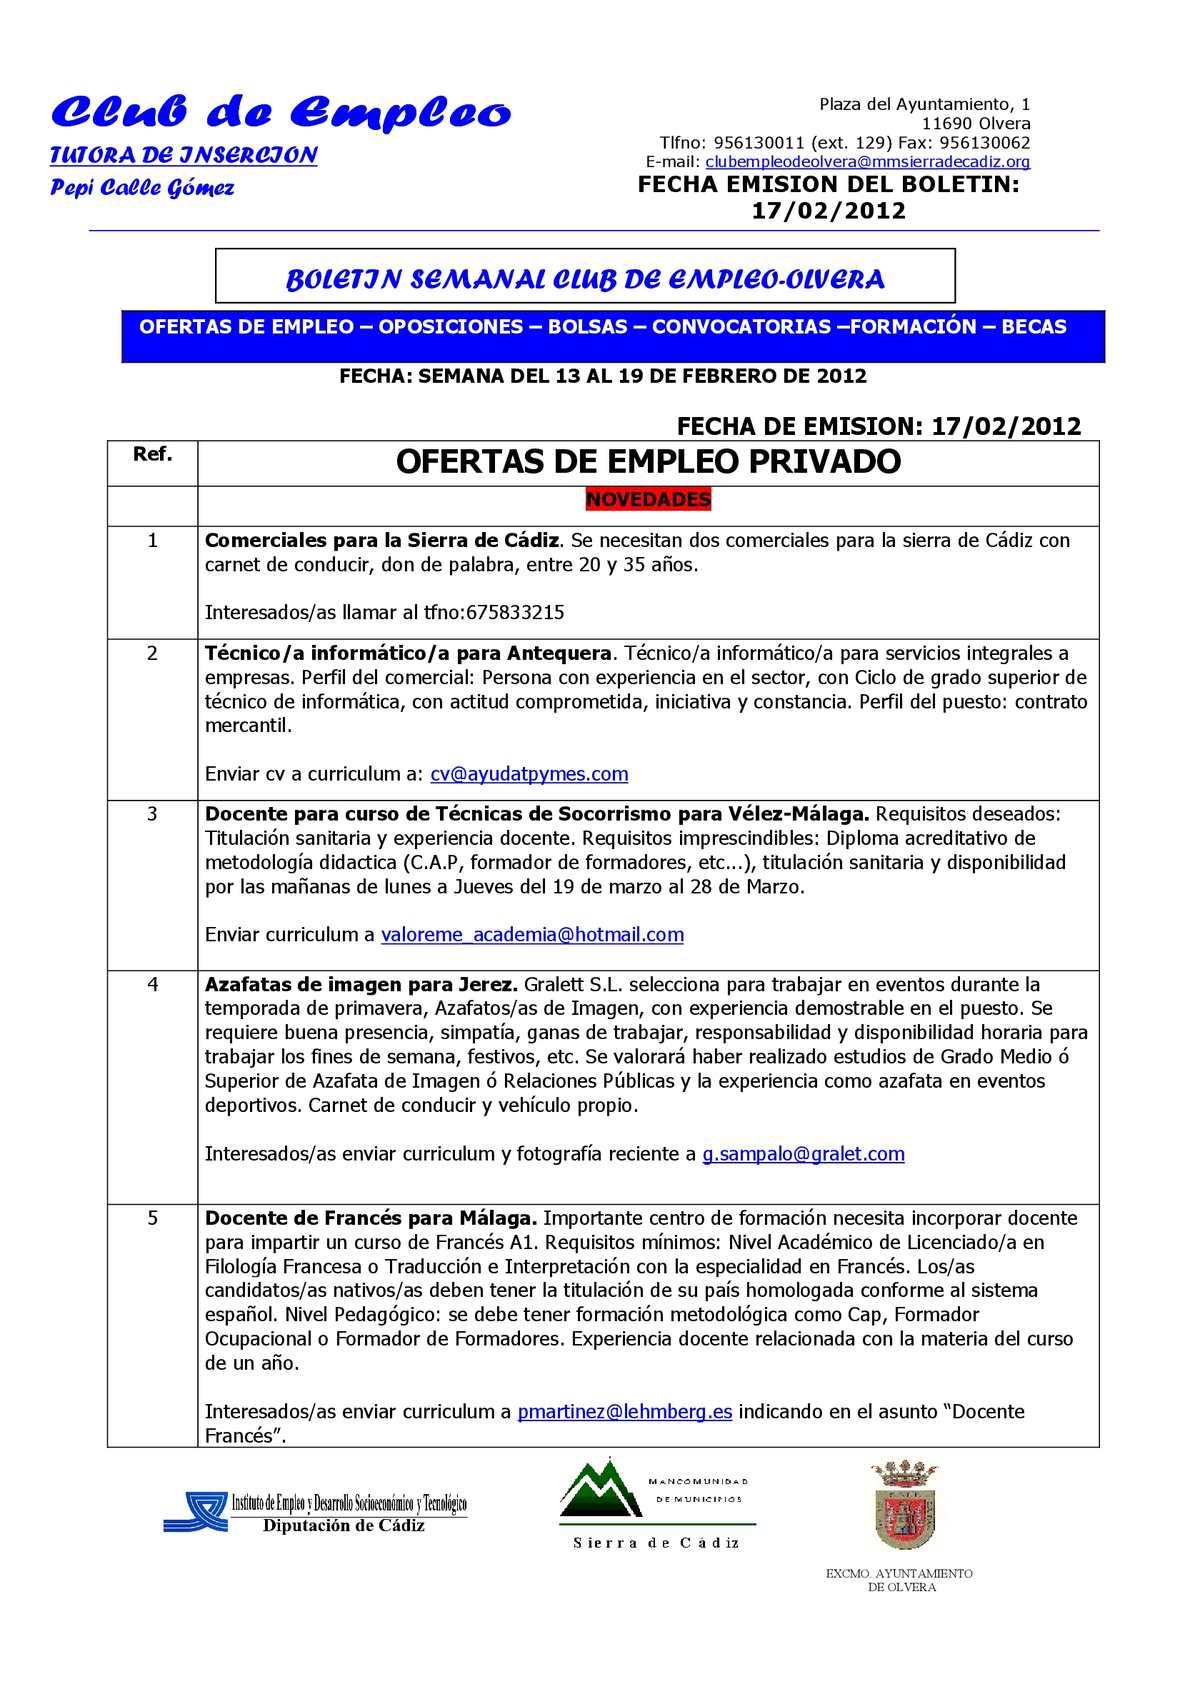 Calaméo - BOLETIN OLVERA 17-02-2012.pdf